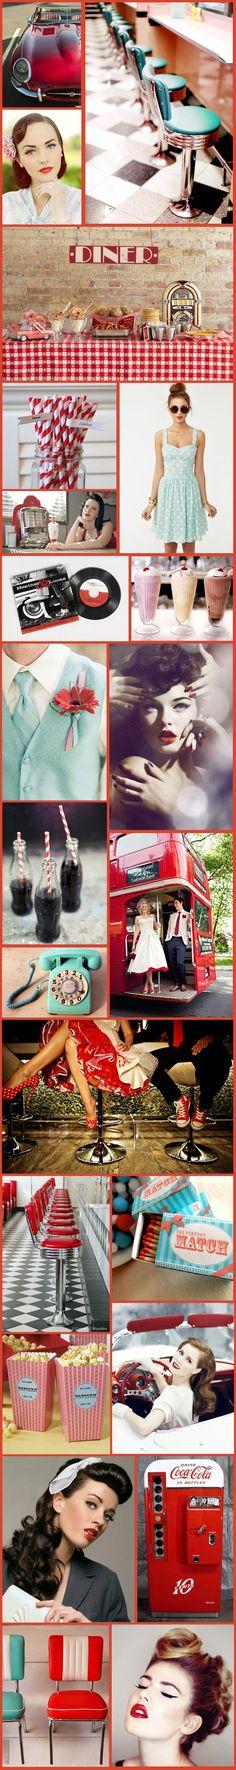 60s wedding Сердце к сердцу, рука к руке, кольцо к кольцу. С любовью http://www.ringtoring.ru/